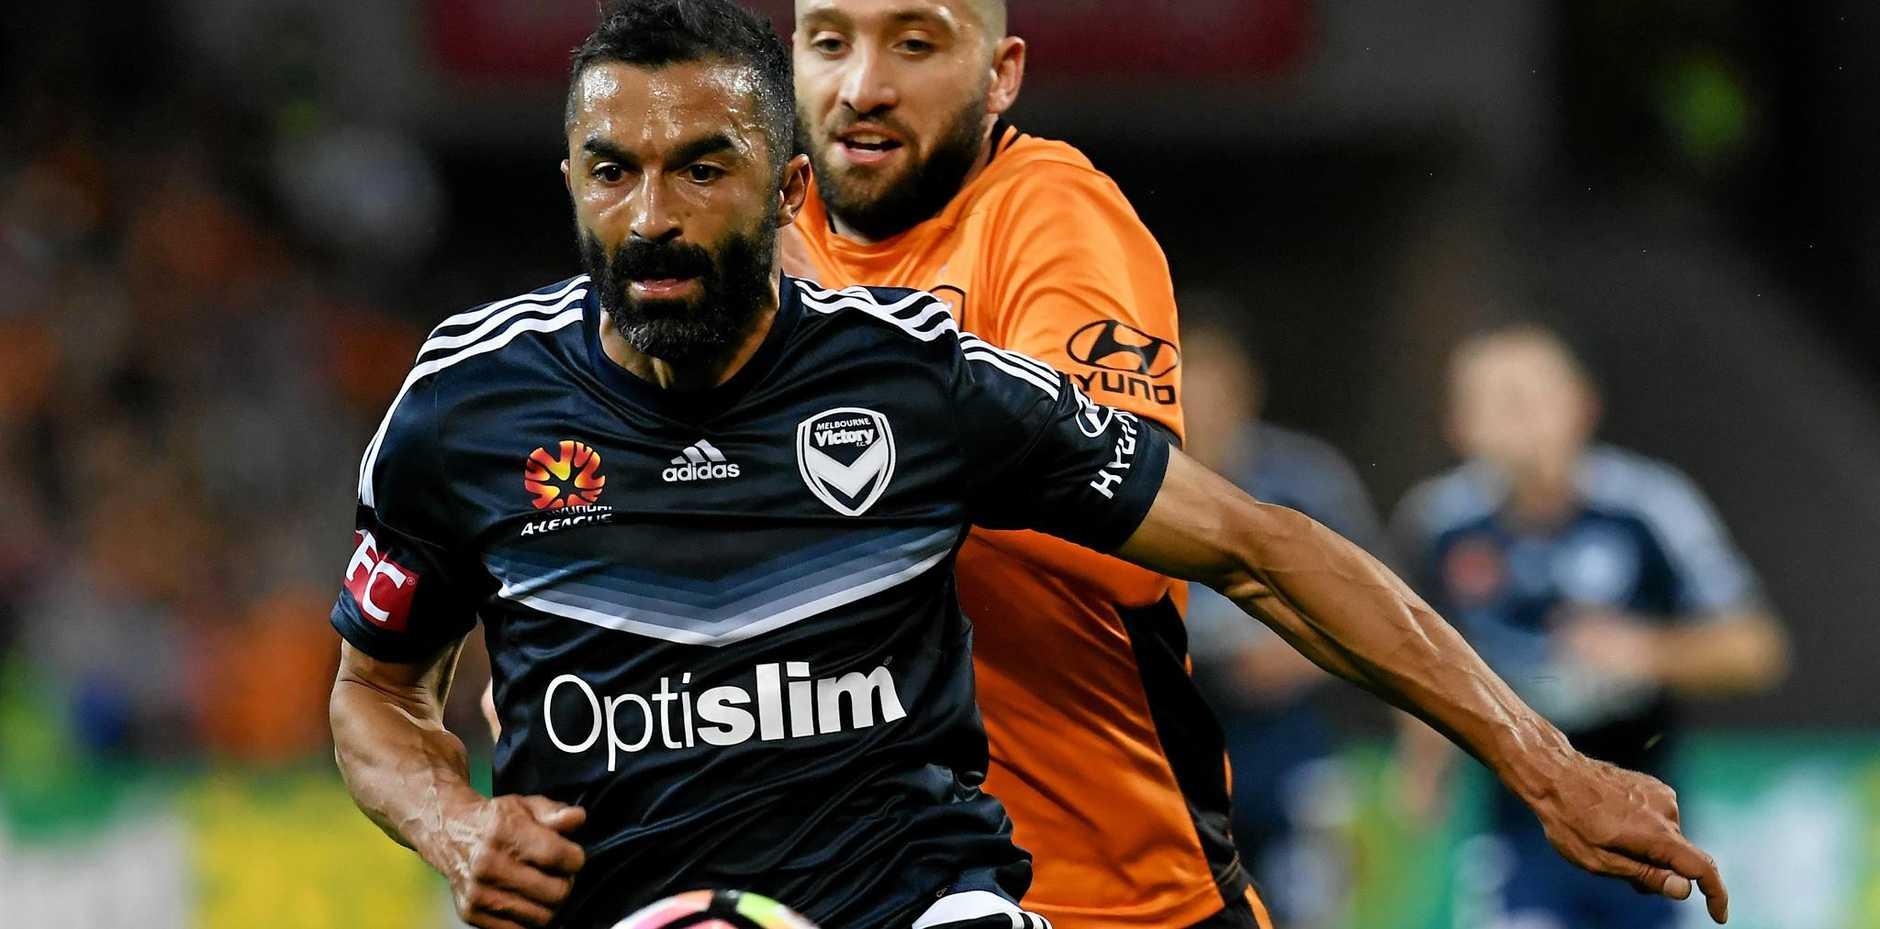 NEW ADDITION: Former Melbourne Victory star Fahid Ben Khalfallah has begun pre-season training with his new club Brisbane Roar.